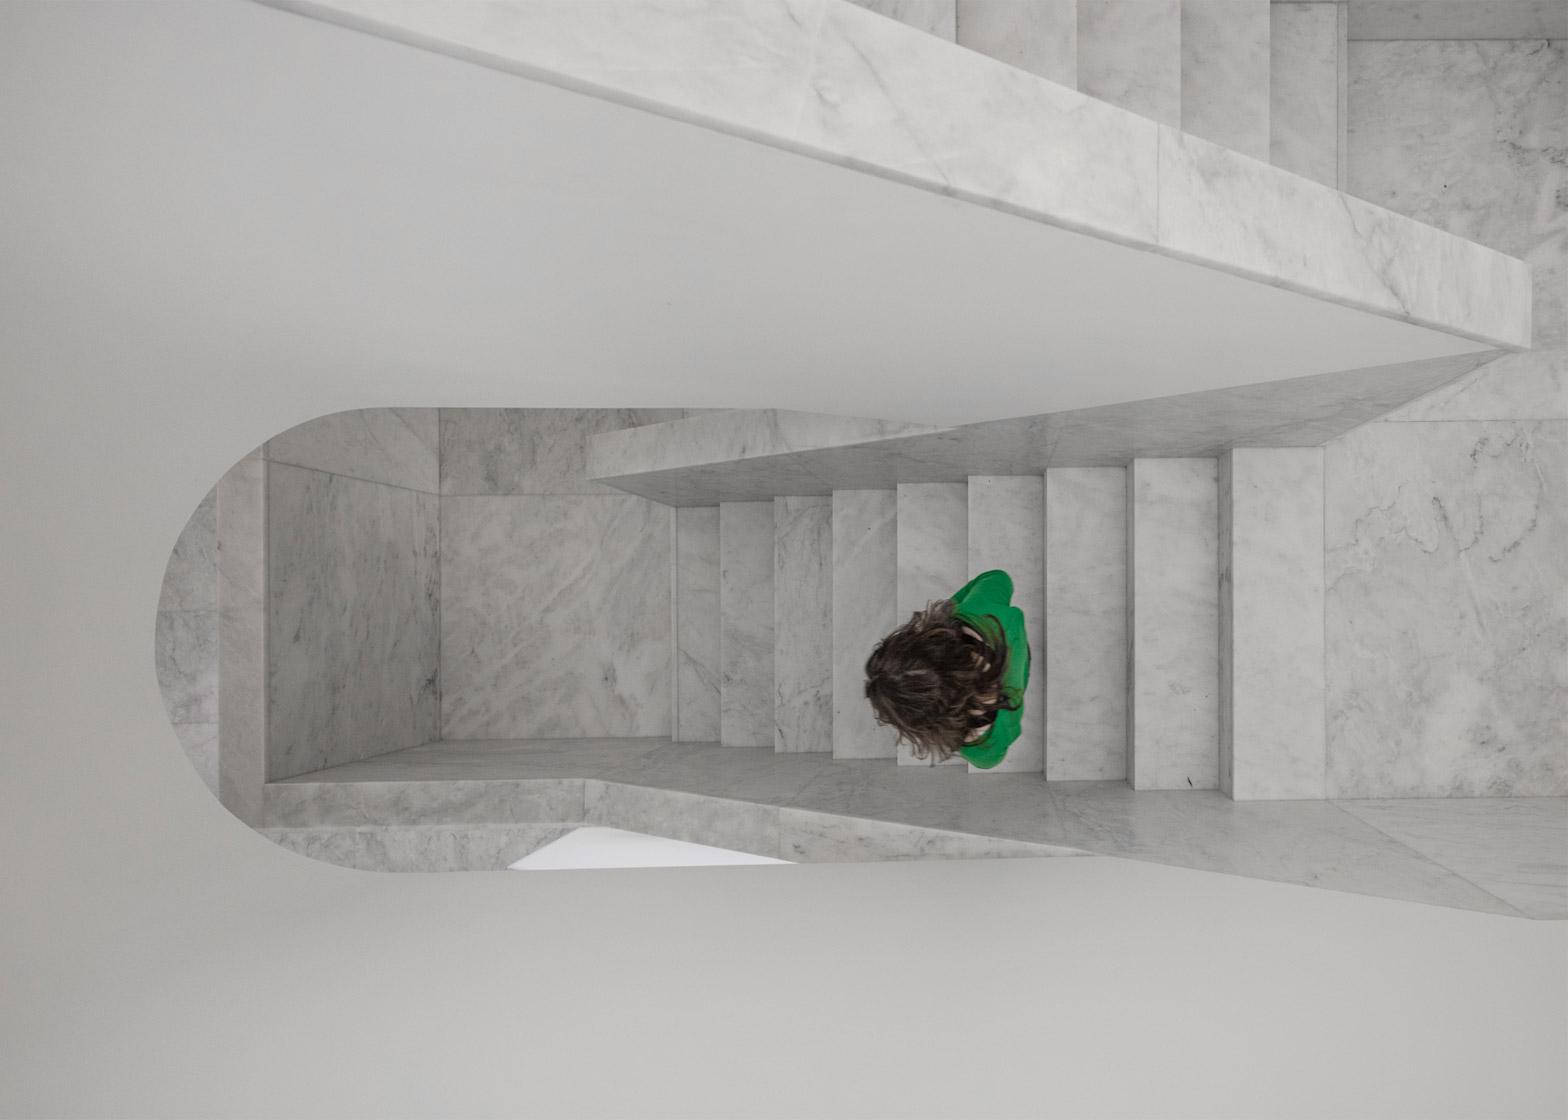 5-premiados-arquitetos-portugueses-se-unem-para-reformar-museu